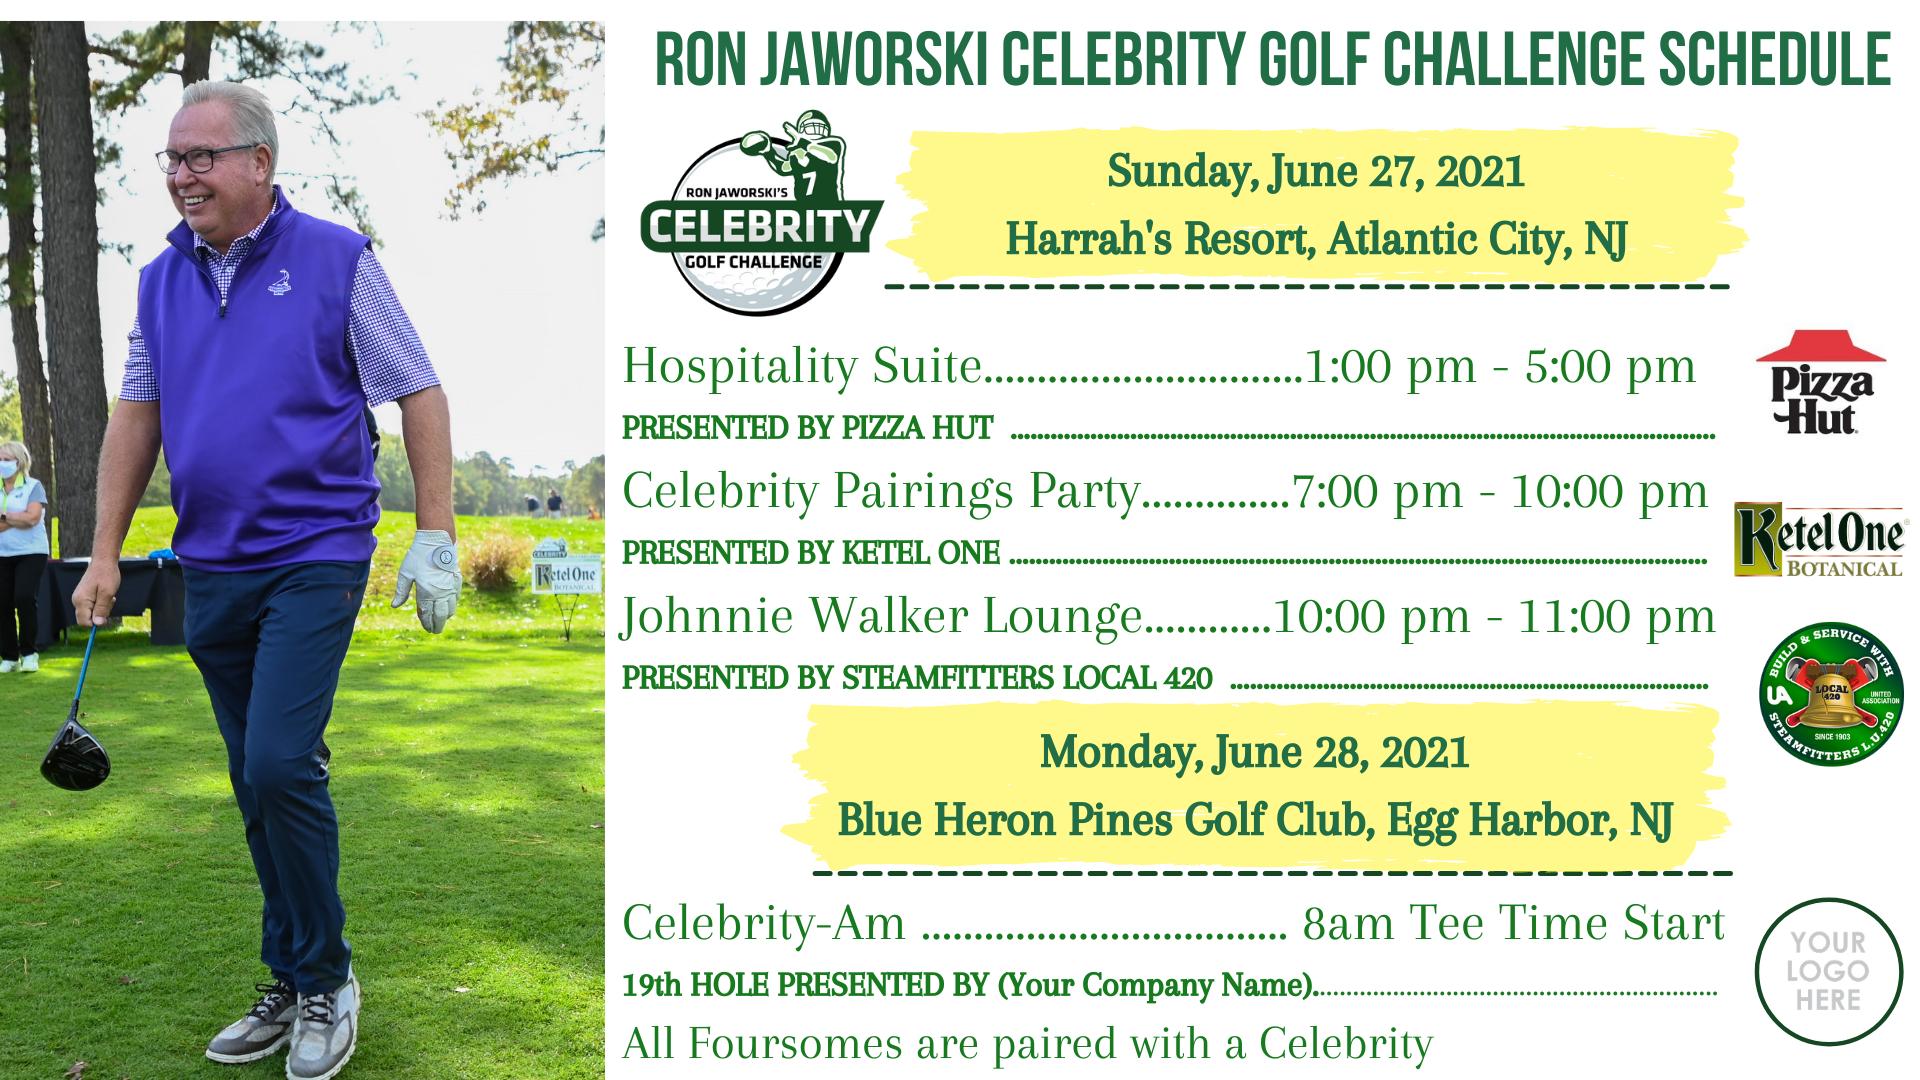 Ron Jaworski Celebrity Golf Challenge June 27-28, 2021